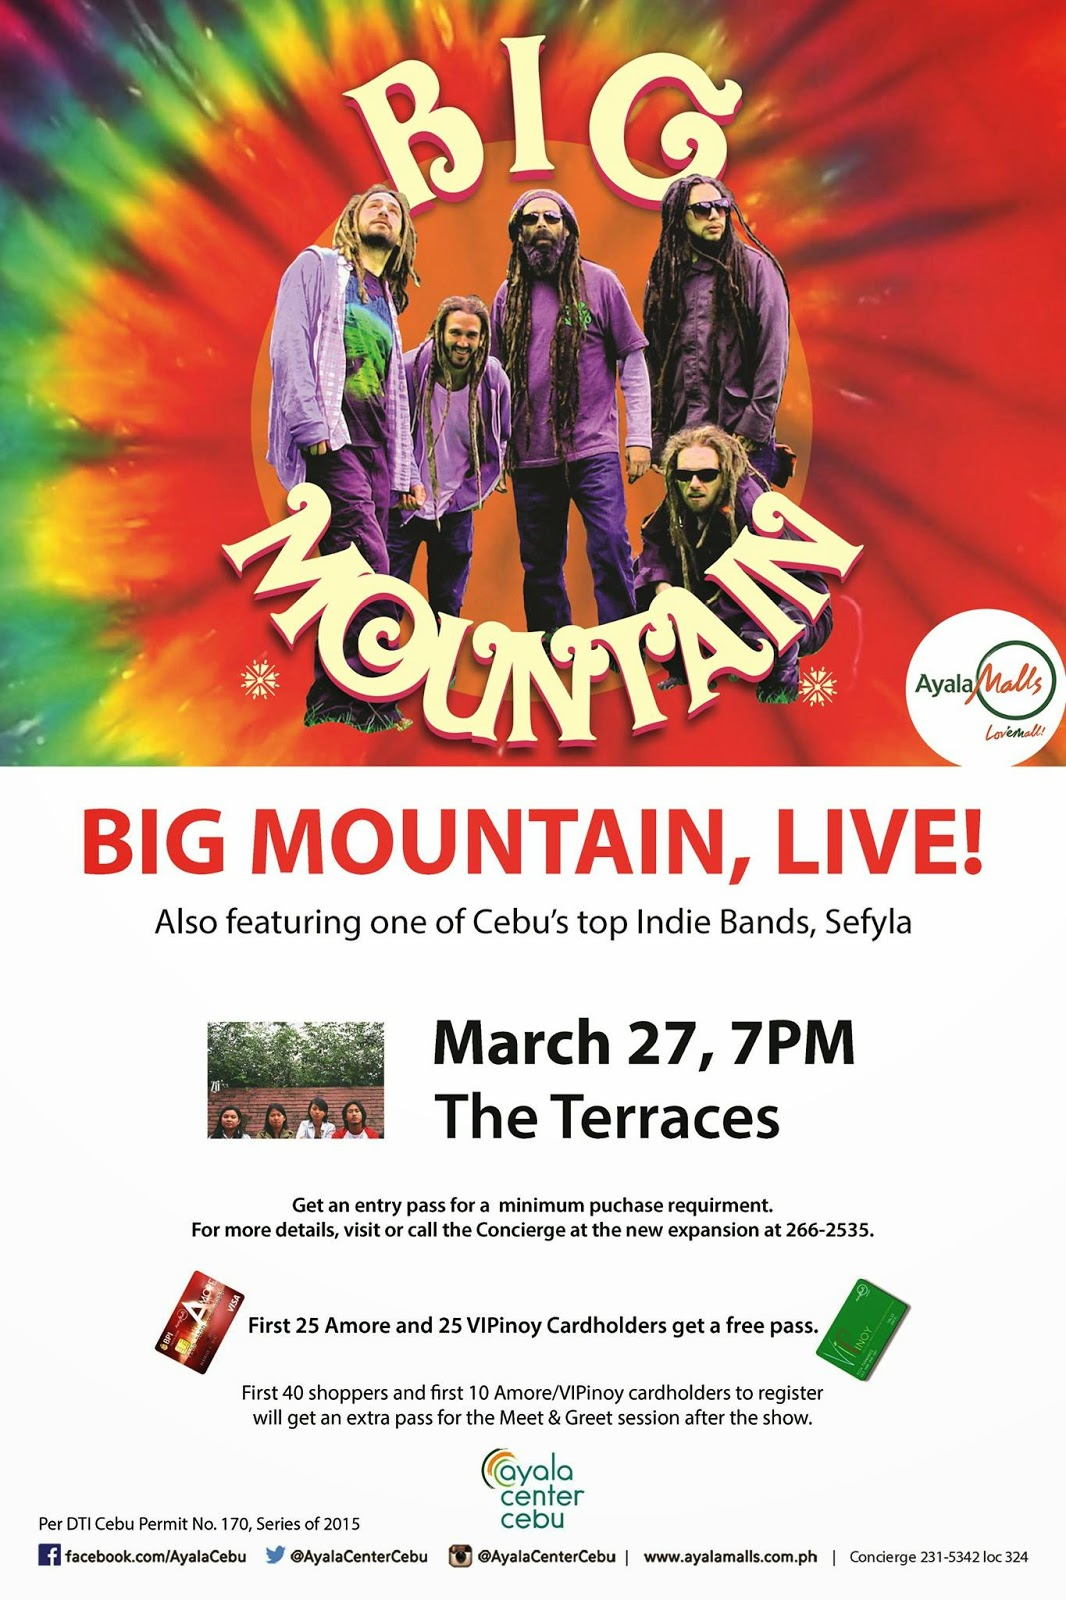 Big-Mountain-Ayala-Center-Cebu